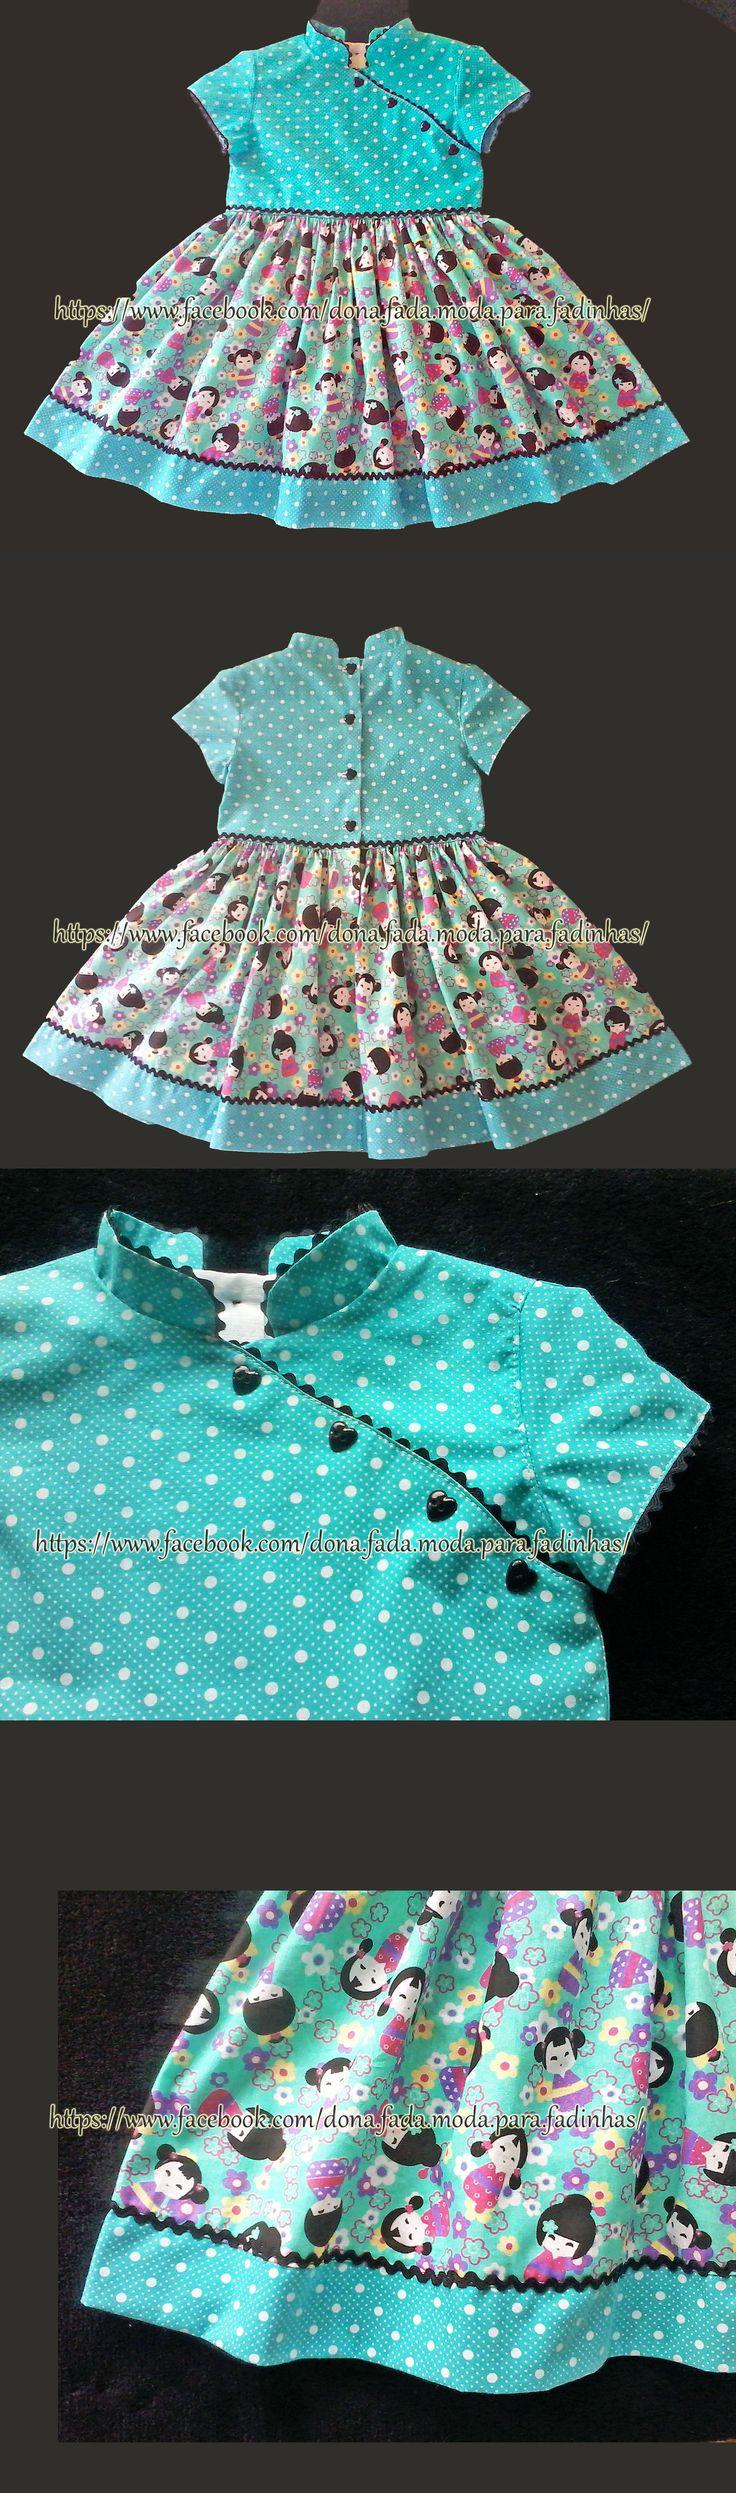 Vestido bonequinha chinesa - 3/4 anos - - - - - -Chinese doll dress - 3/4 years- - - - - baby - infant - toddler - kids - clothes for girls - - - https://www.facebook.com/dona.fada.moda.para.fadinhas/